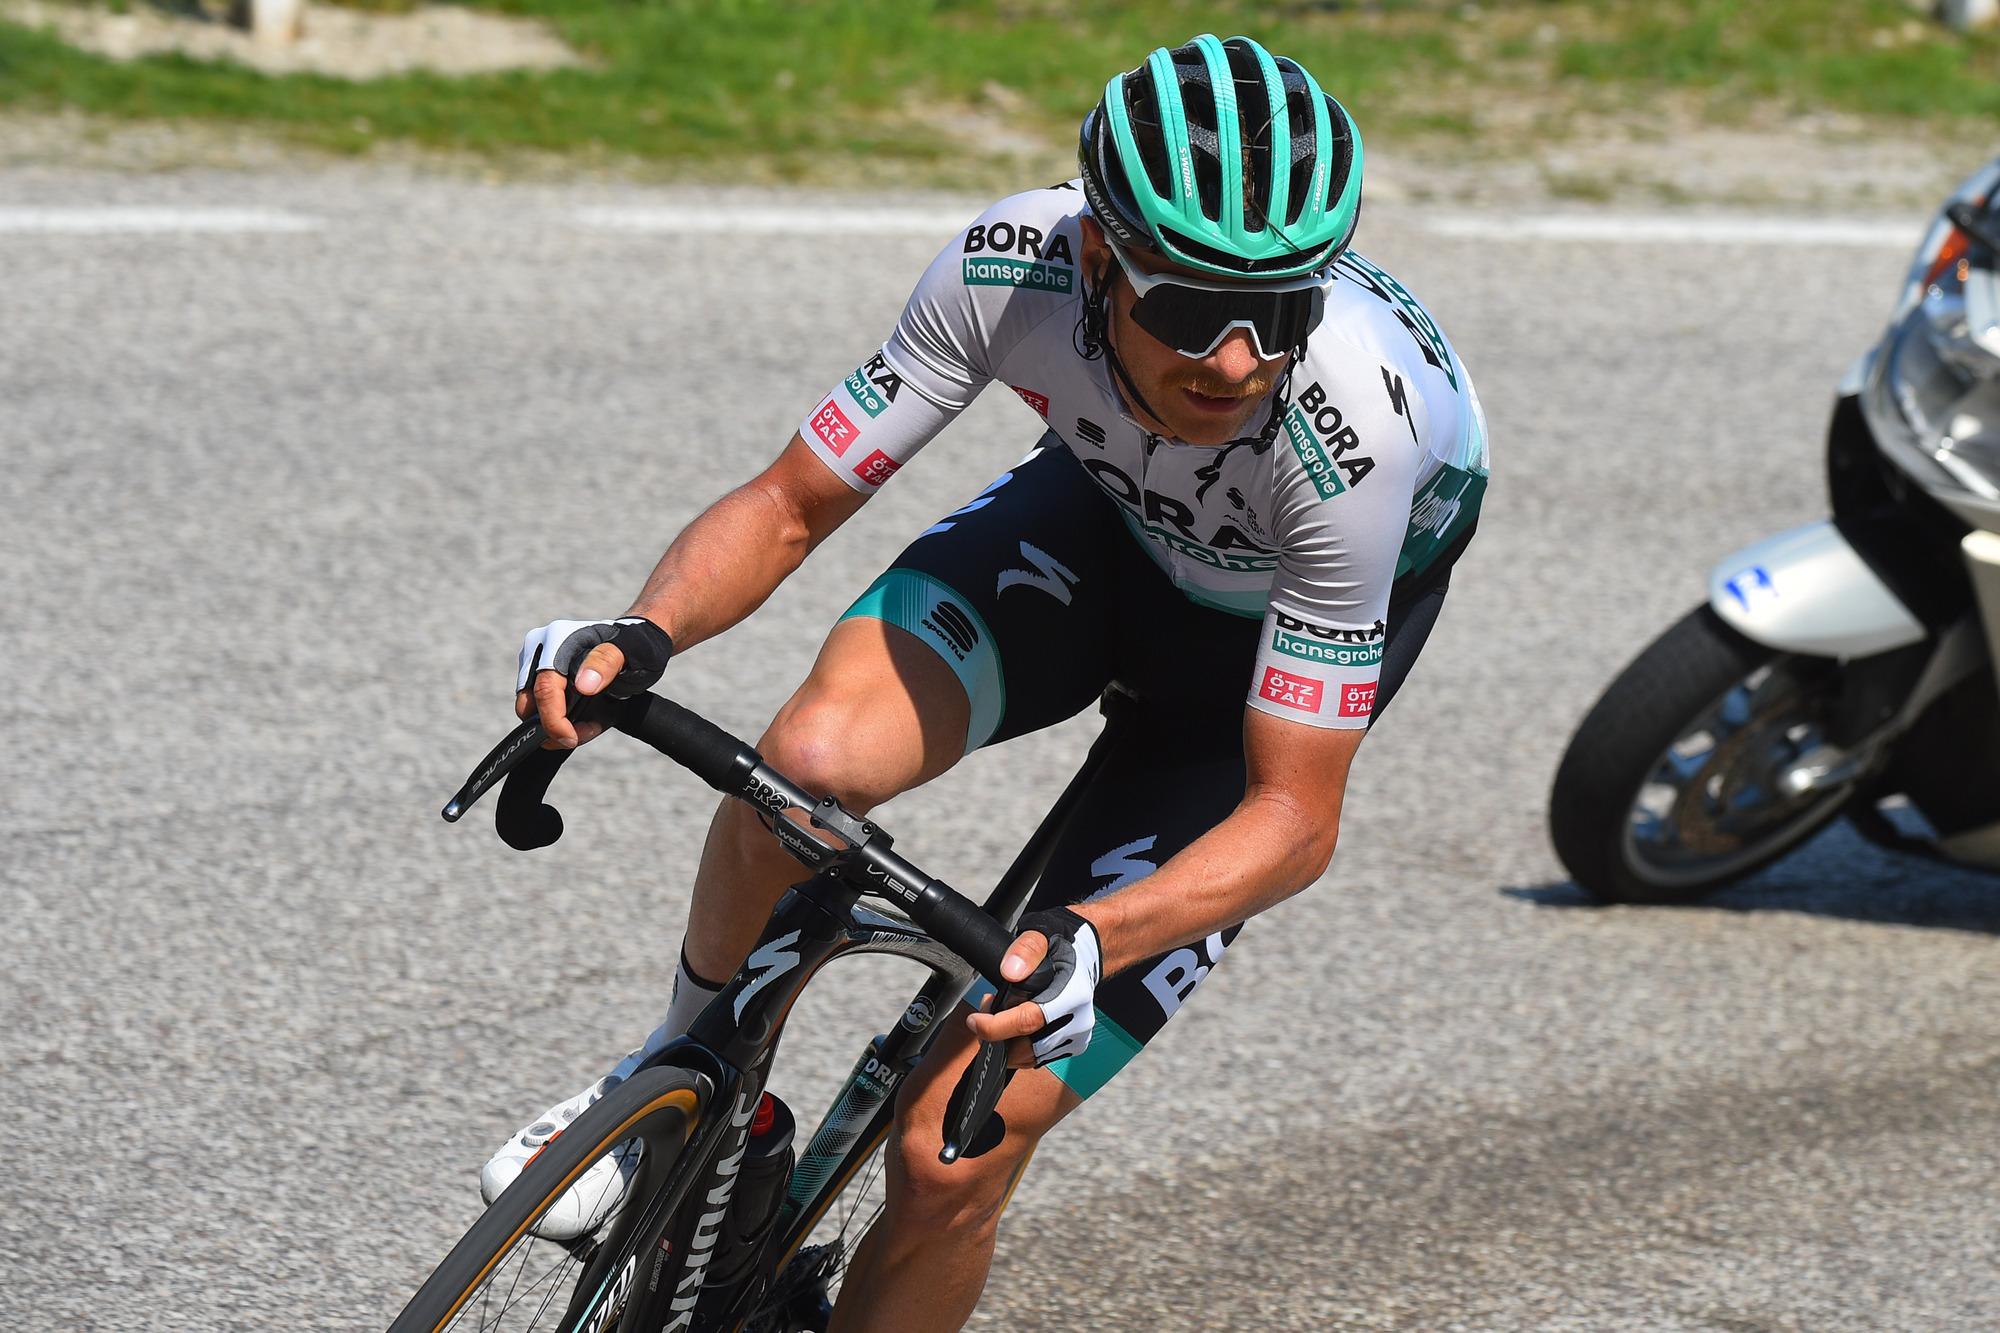 Tour of the Alps 2021 45th Edition 5th stage Valle del ChieseIdroland Riva del Garda 1209 km 23042021 Felix Grossschartner AUT Bora Hansgrohe photo Dario BelingheriBettiniPhoto2021